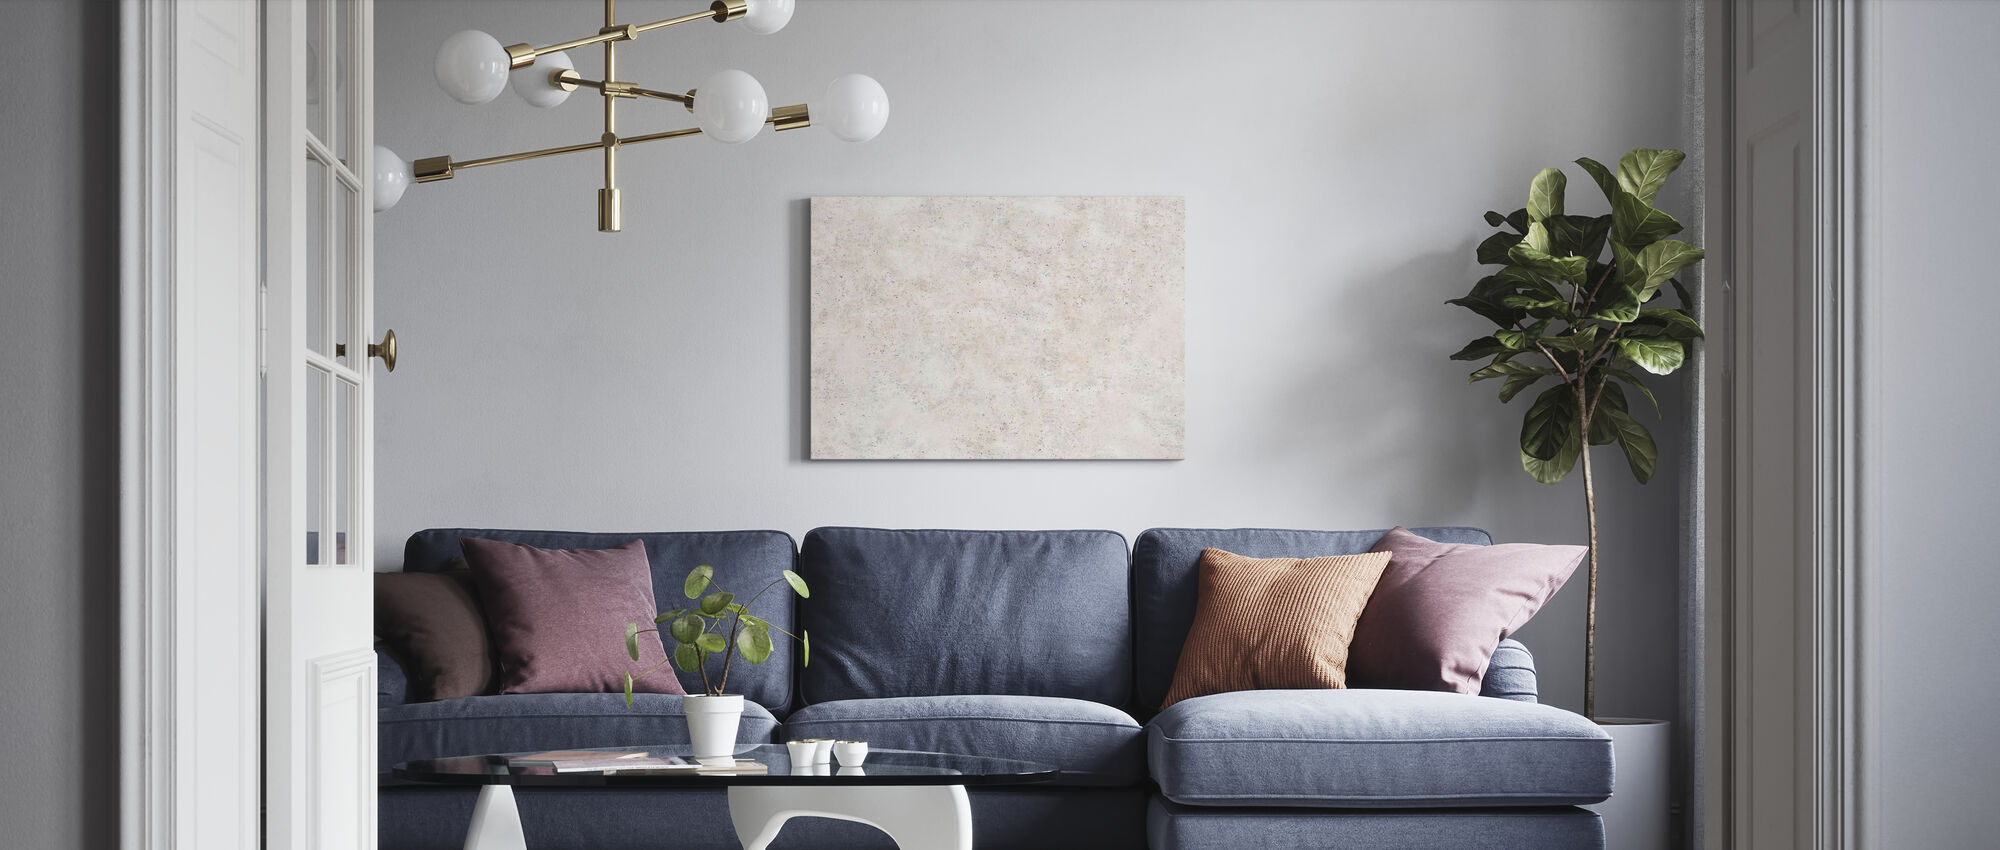 Rough Beige Concrete Wall - Canvas print - Living Room